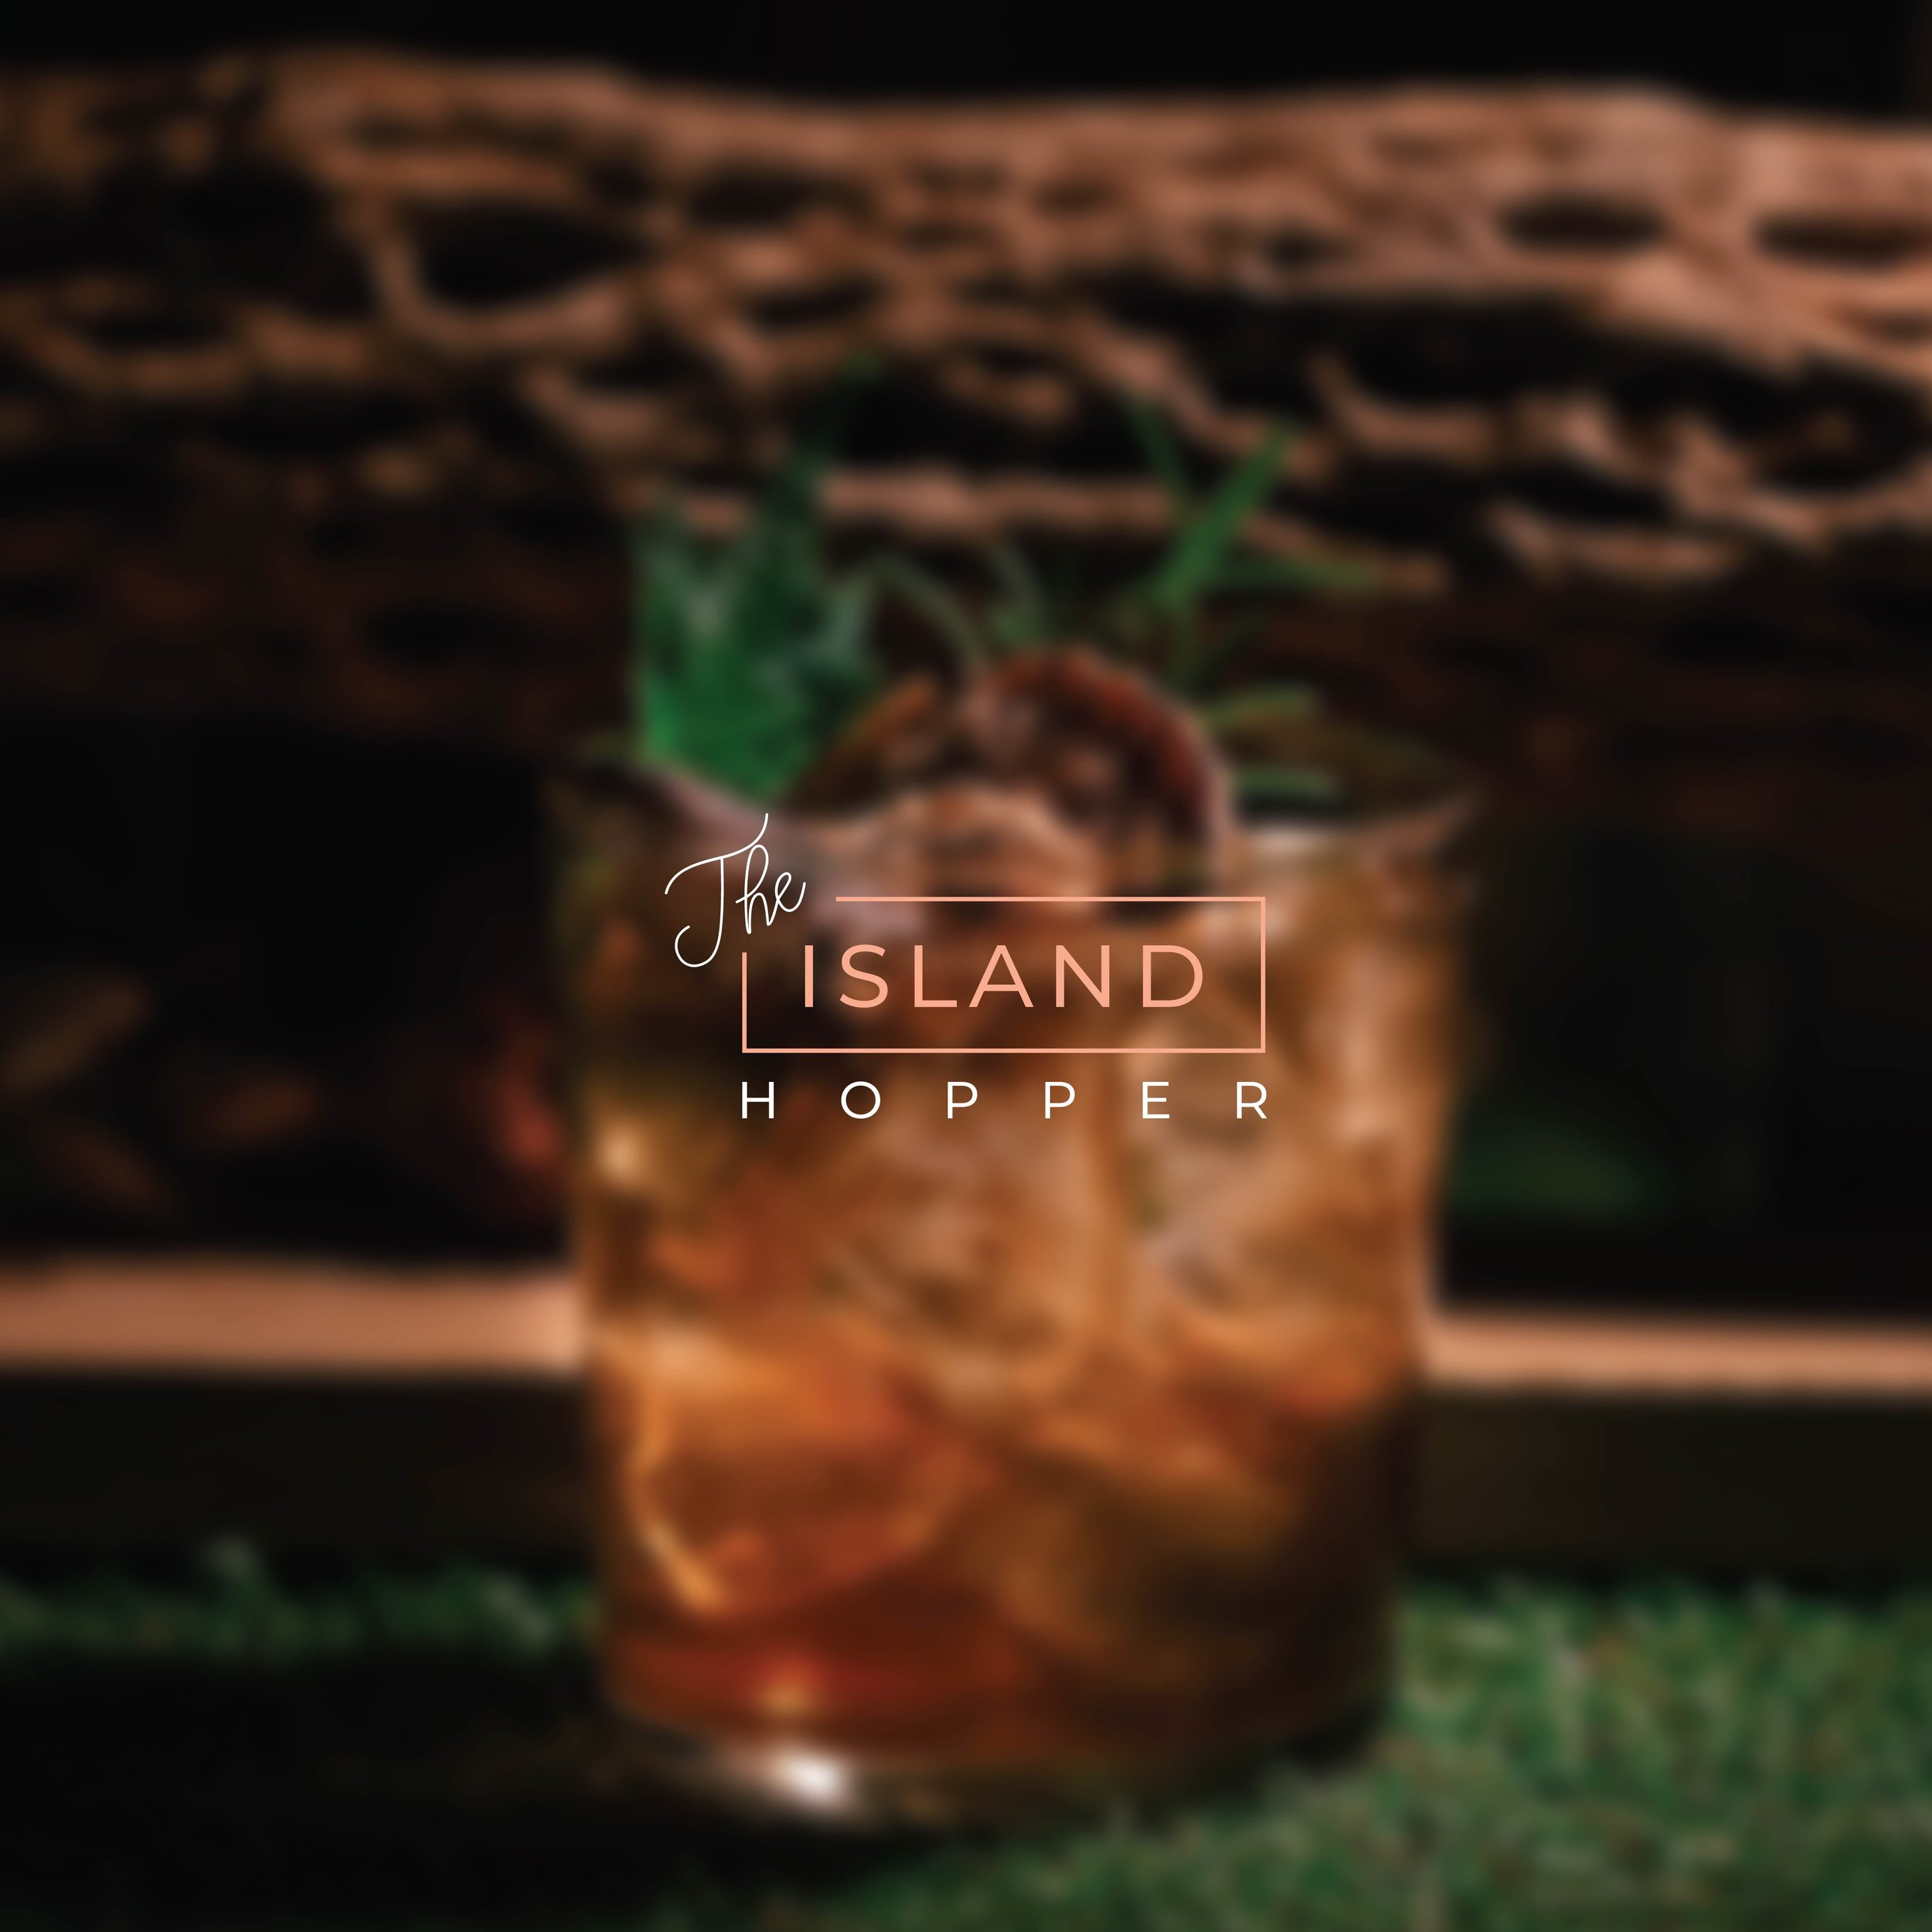 Logo-island-hopper-photo-01.jpg